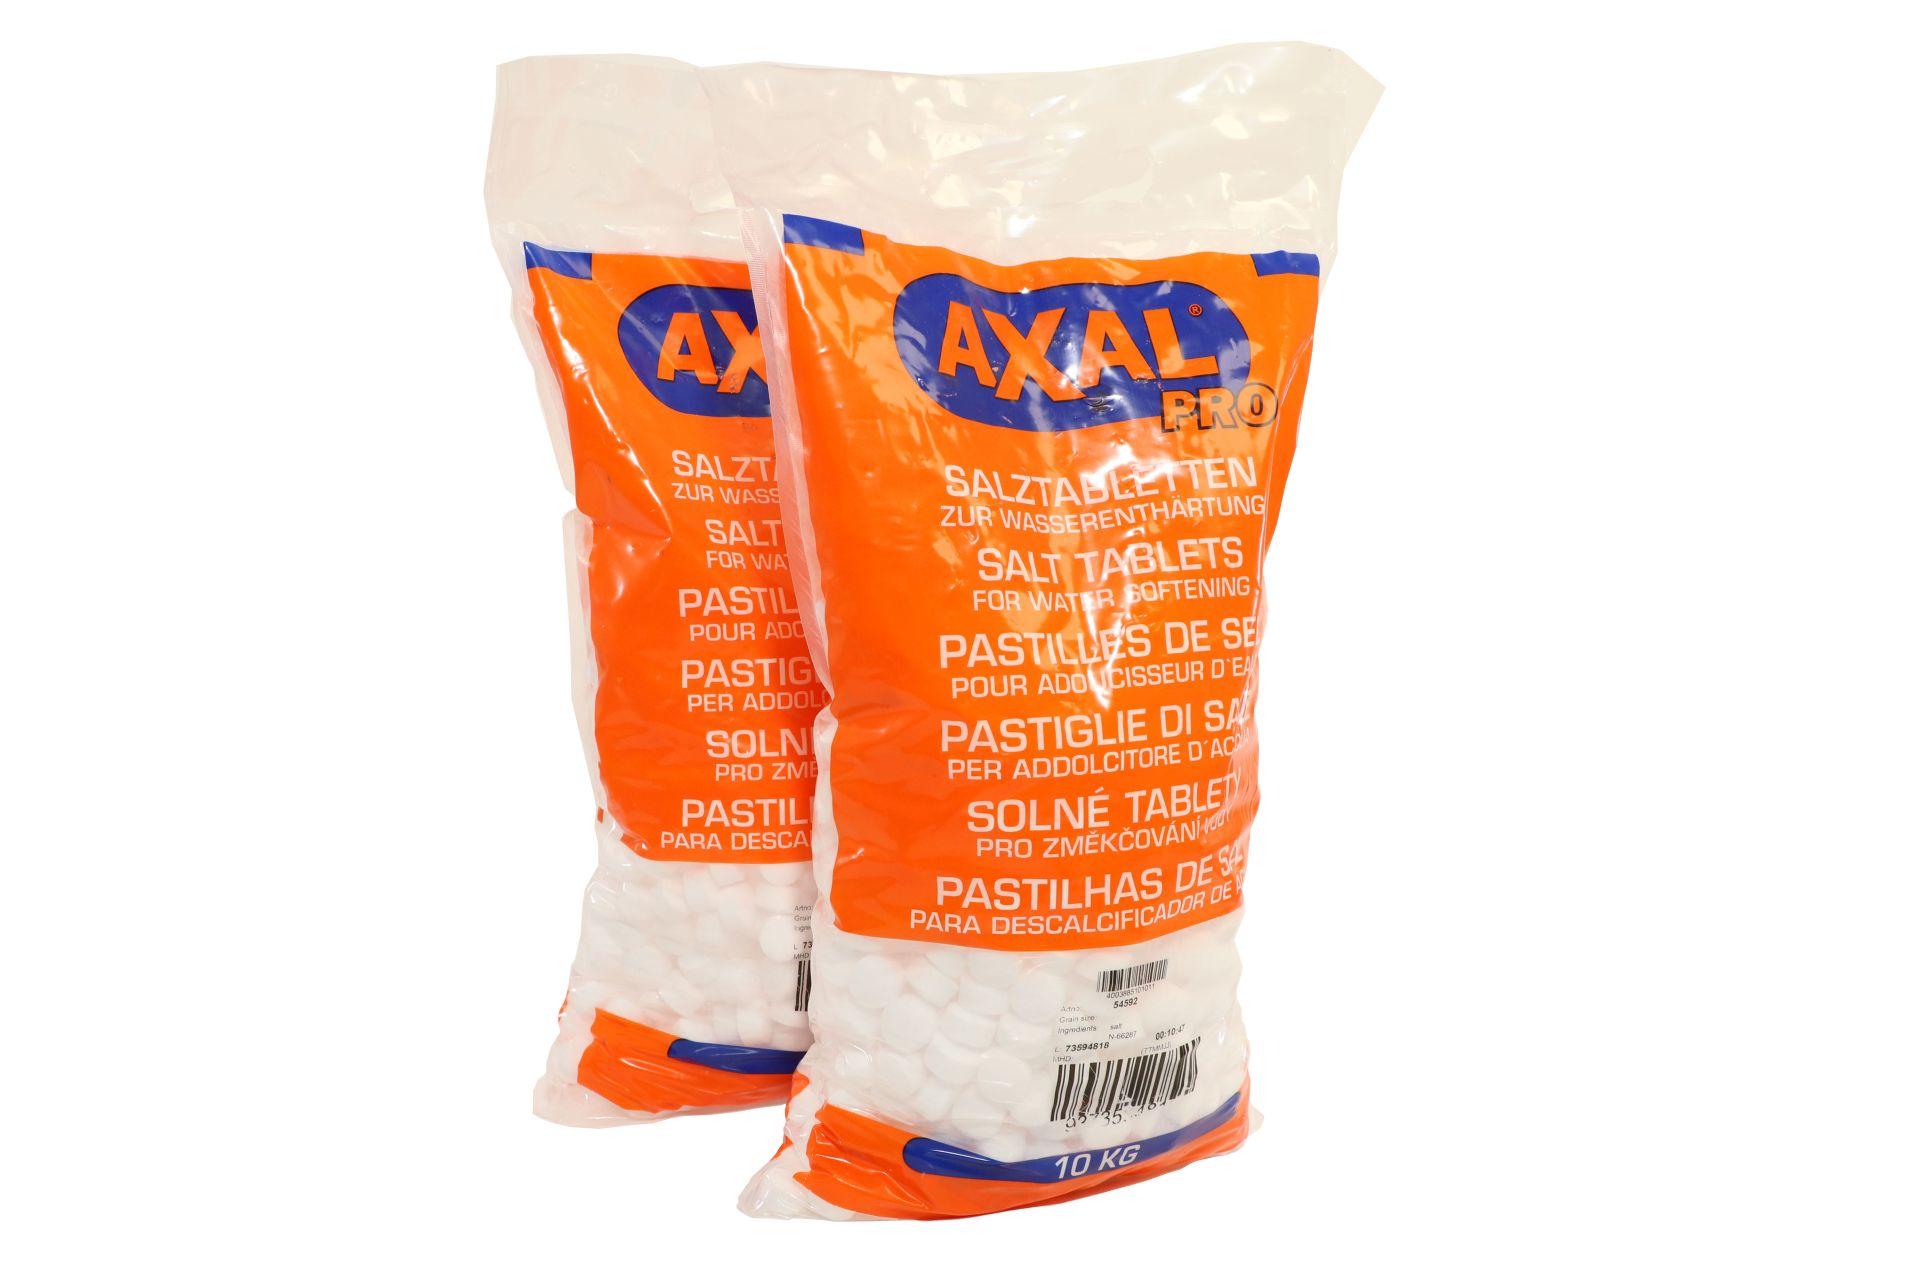 AXAL PRO Regeneriersalz, Tabletten zur Wasseraufbereitung, 20 kg (2 x 10 kg)